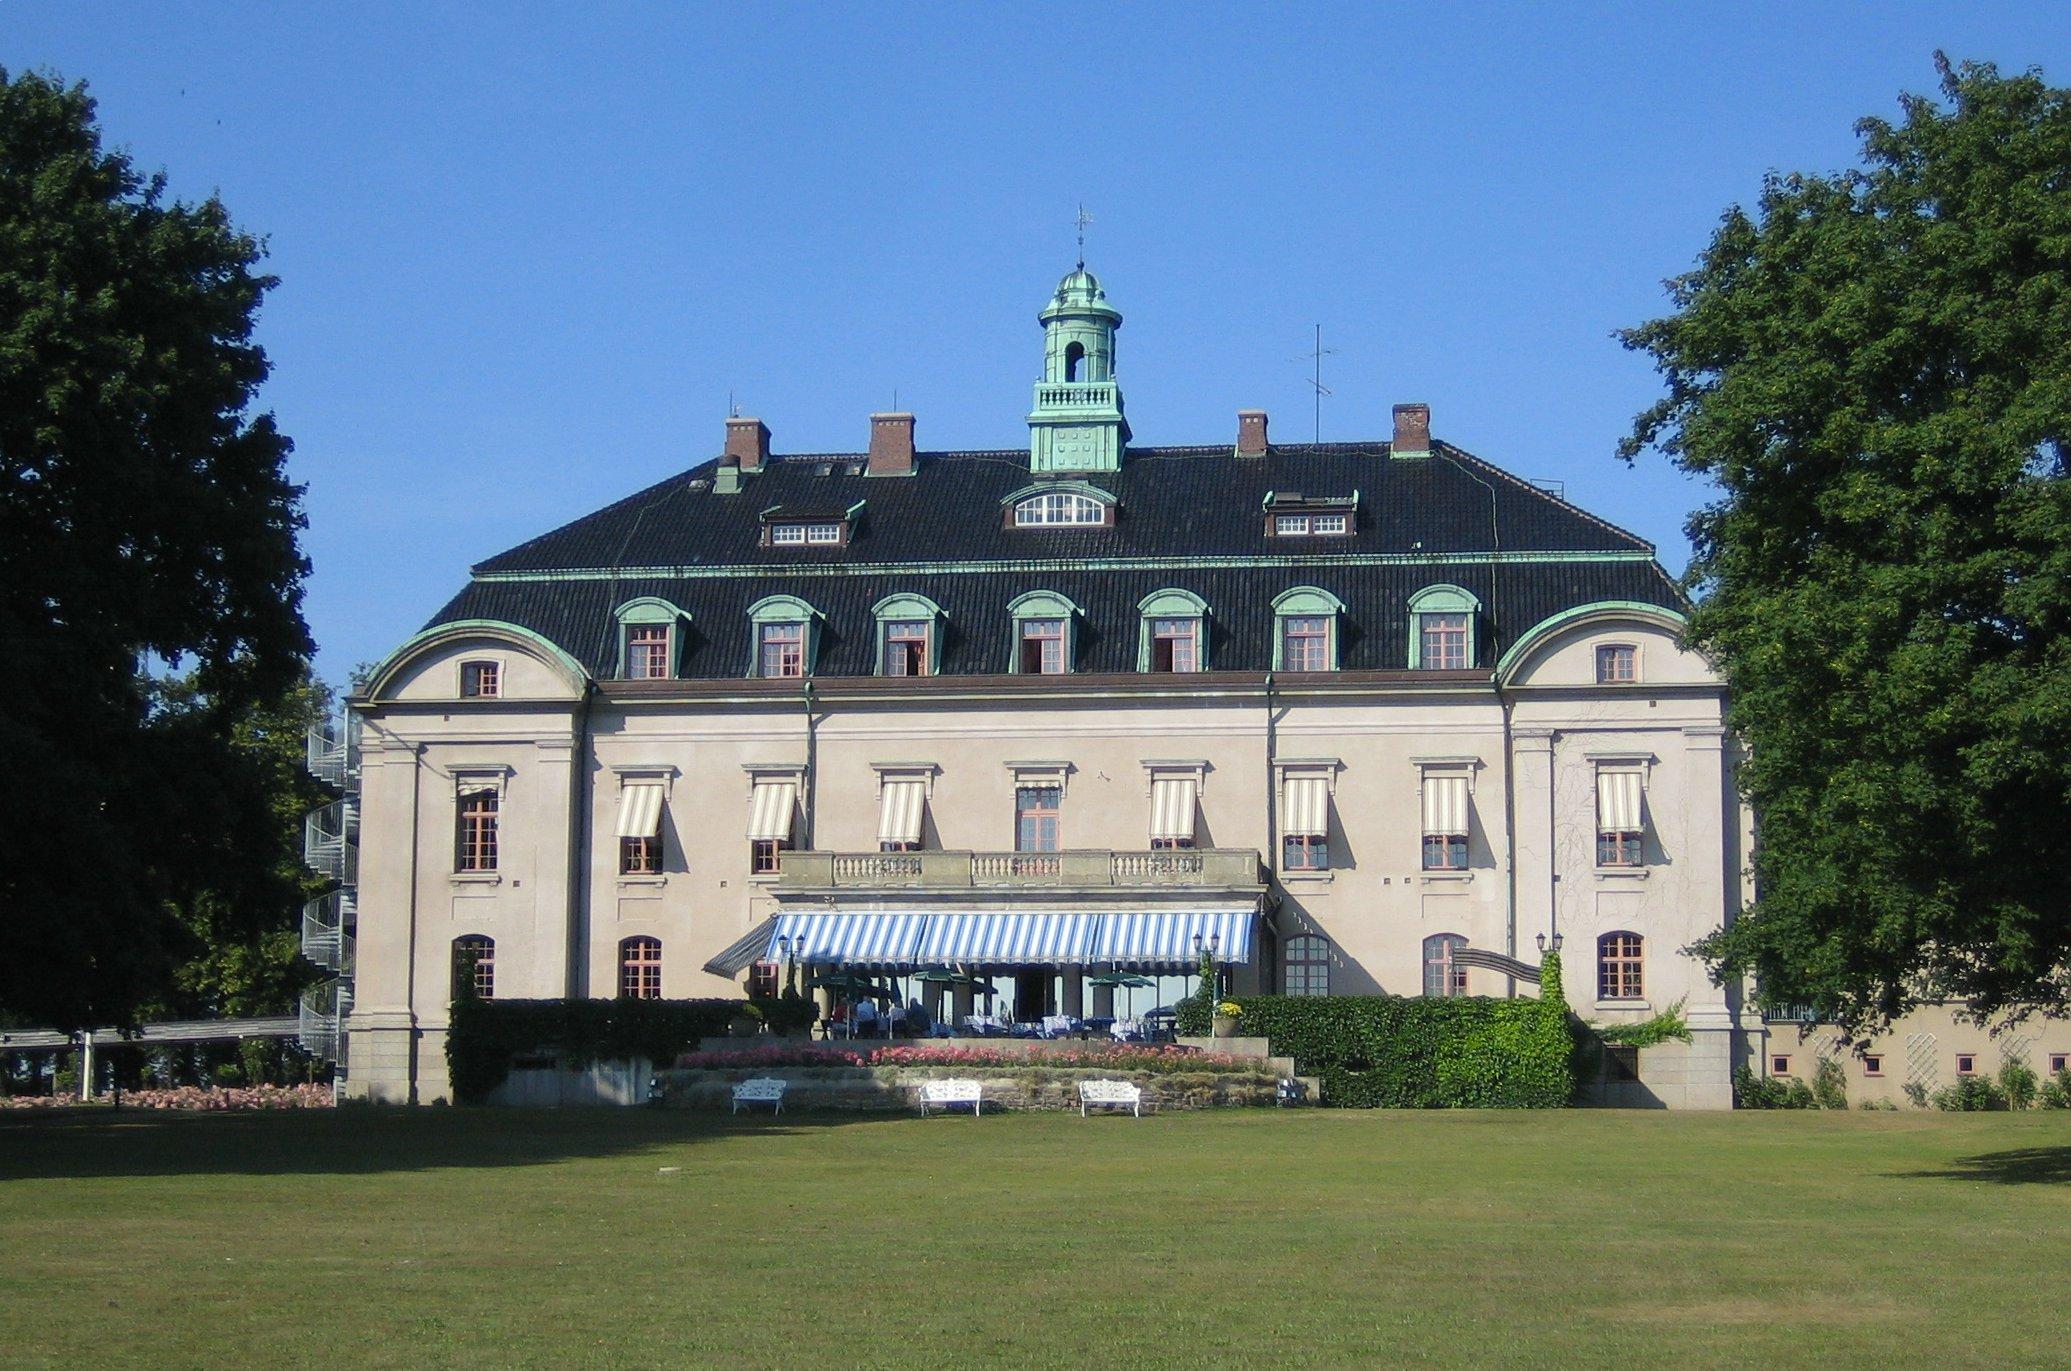 Copenhagen to rens Slott, Hotell & Konferens, Glumslv - 4